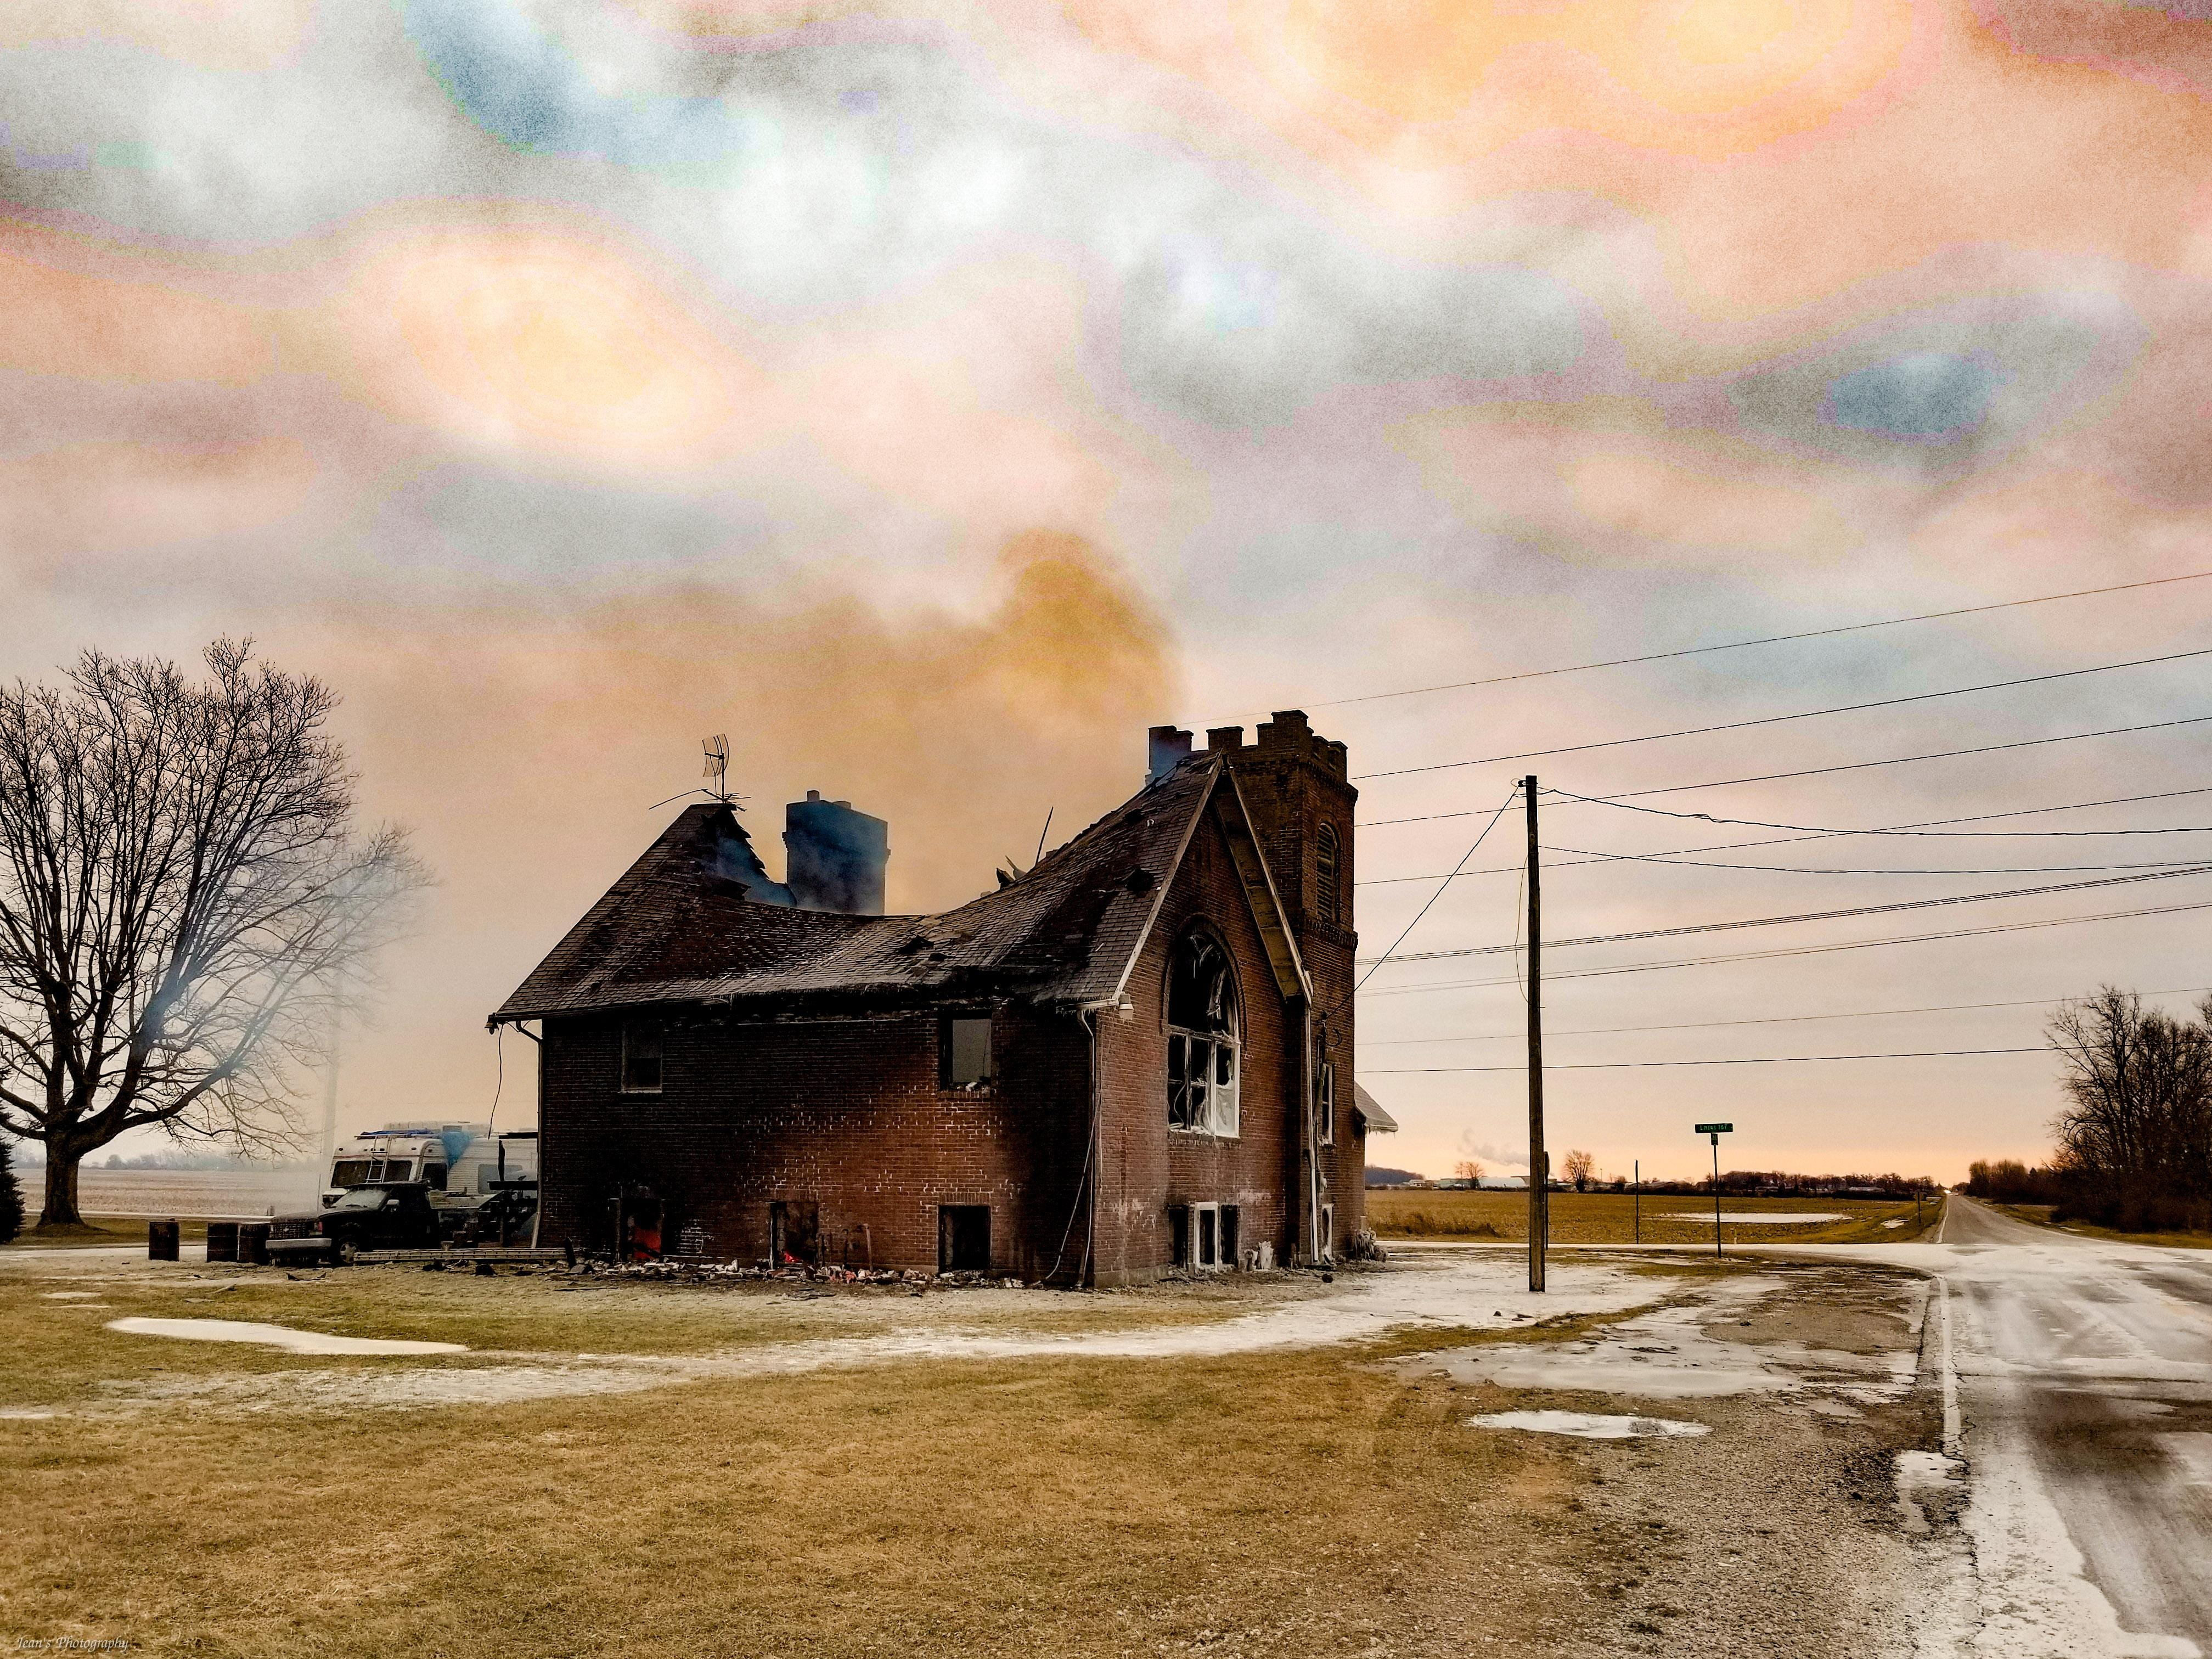 A Friday evening blaze claimed an old church on Likens Road.